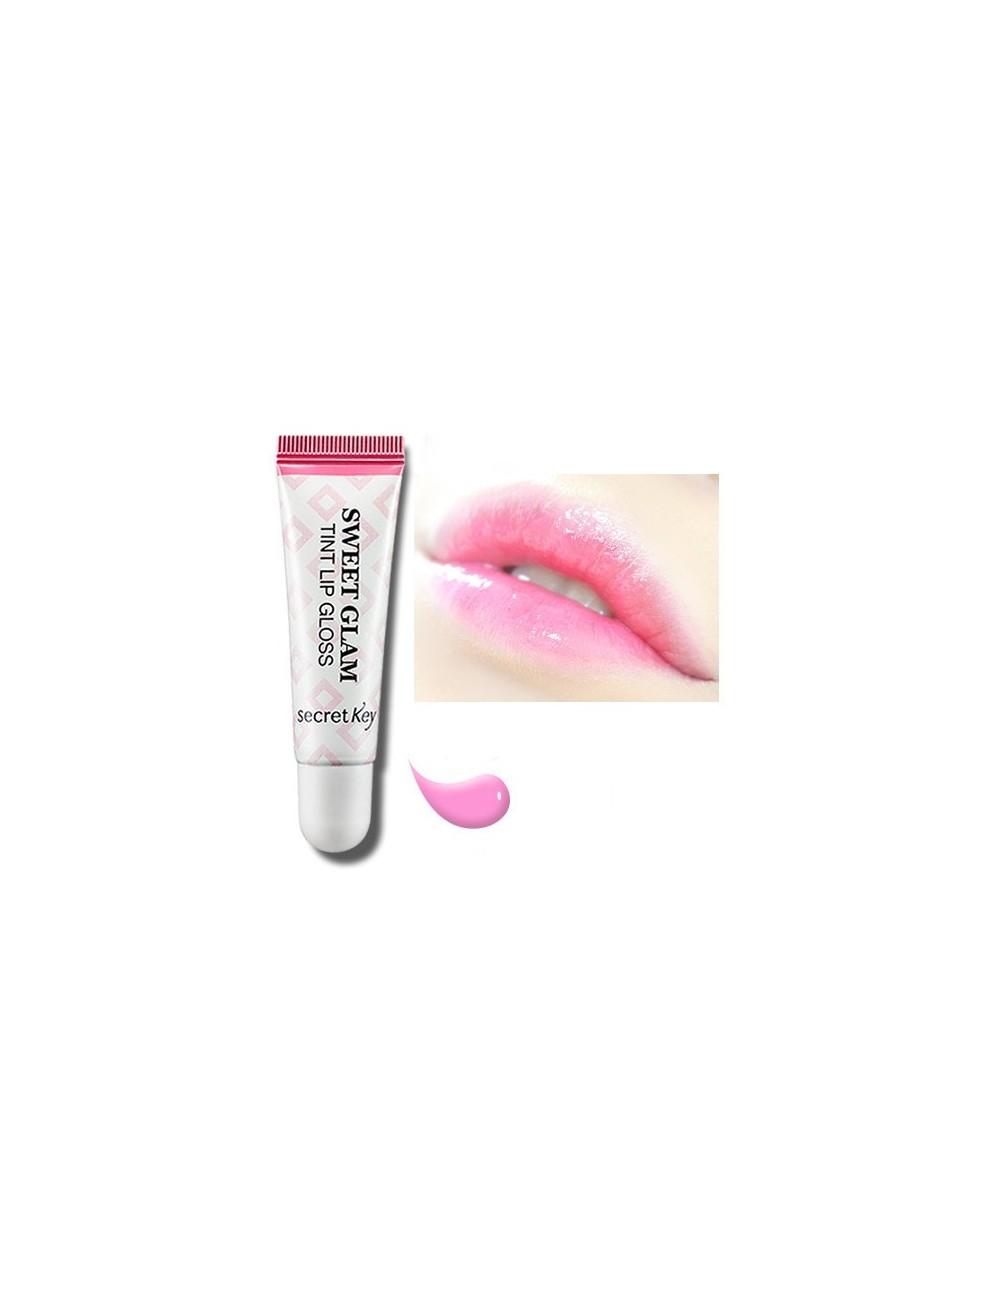 Gloss Hidratante para Labios Secret Key Sweet Glam Lip Tint Gloss Milky Pink